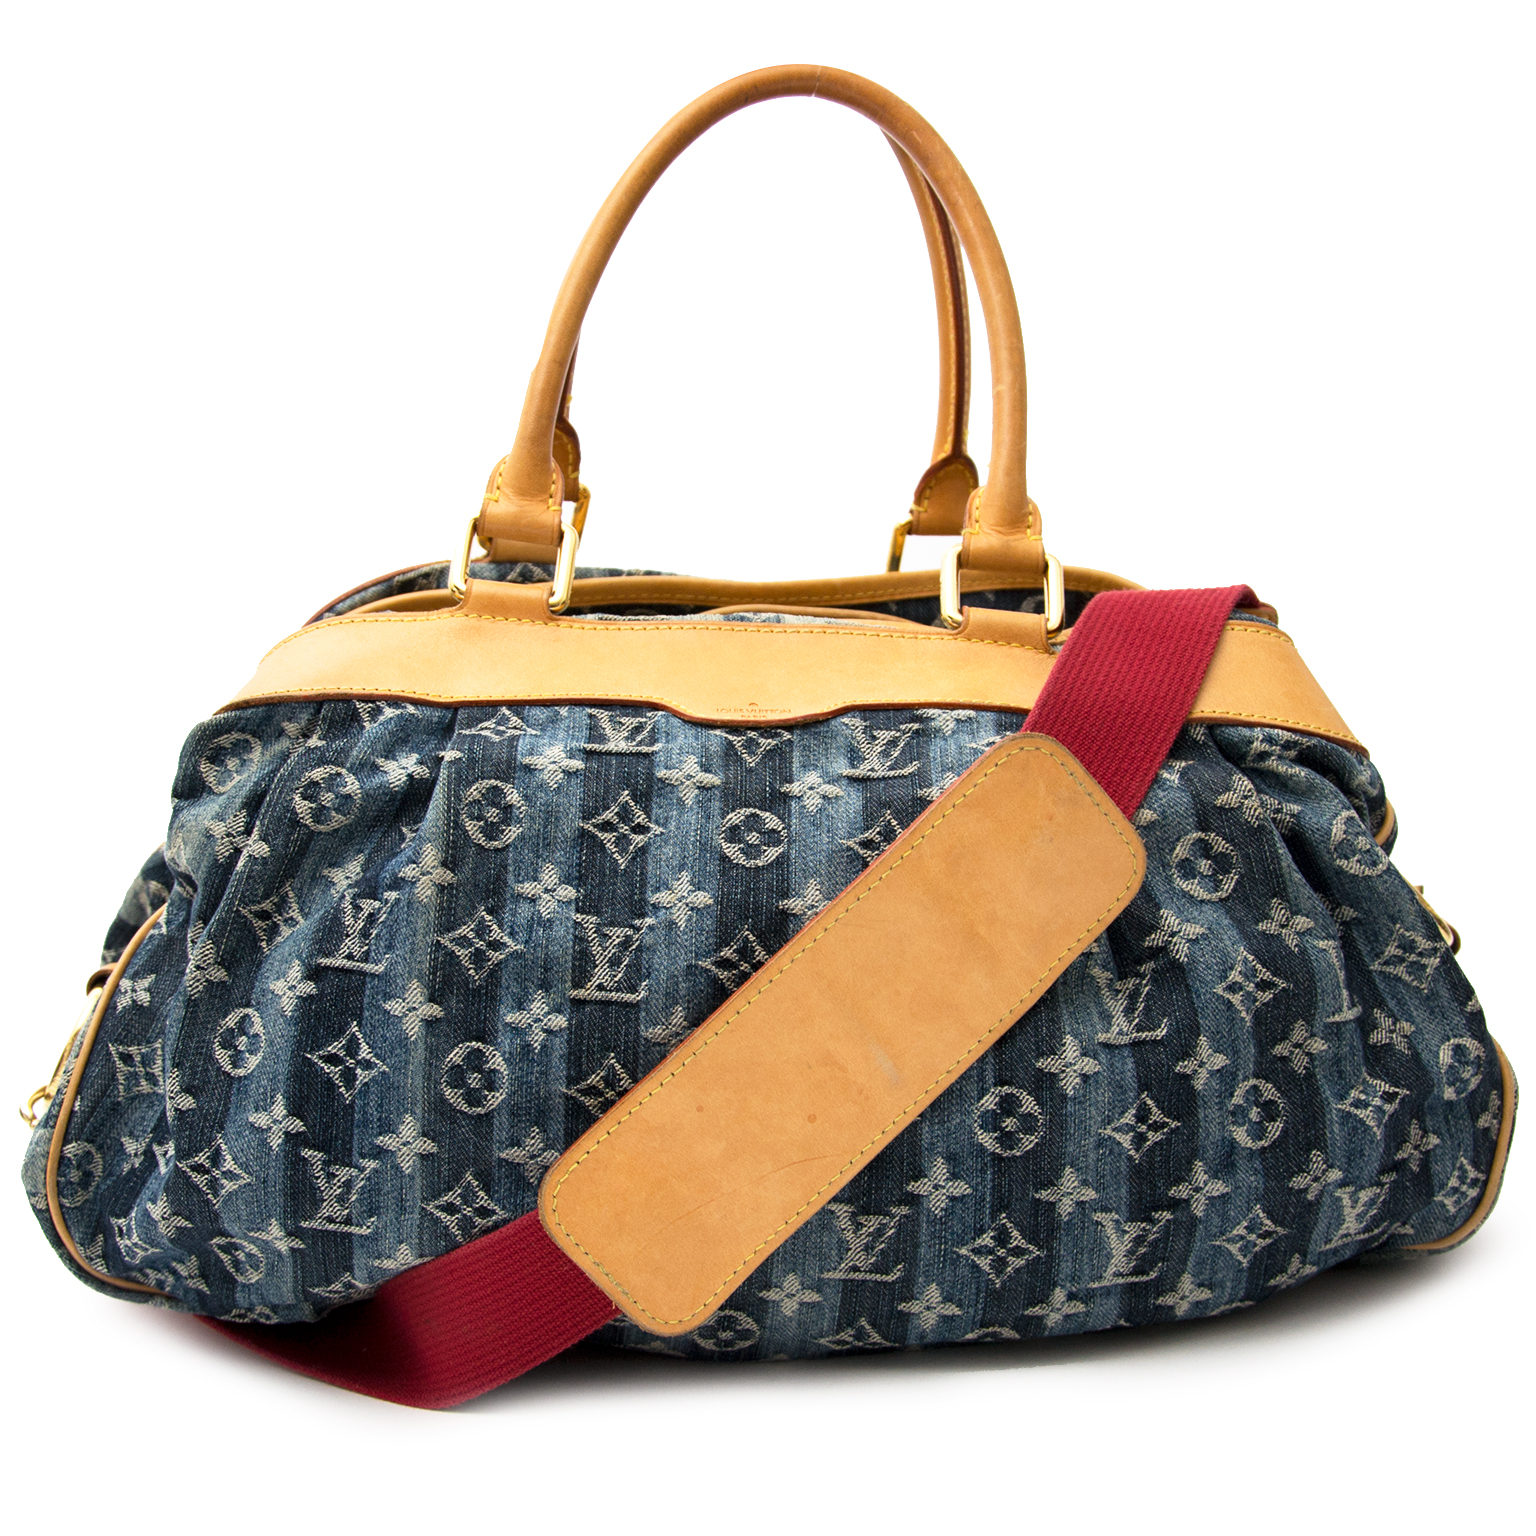 ... Labellov luxury Louis Vuitton Denim Cruise Cabas Raye GM luxe merken  winkelen Antwerpen e9fc991517161